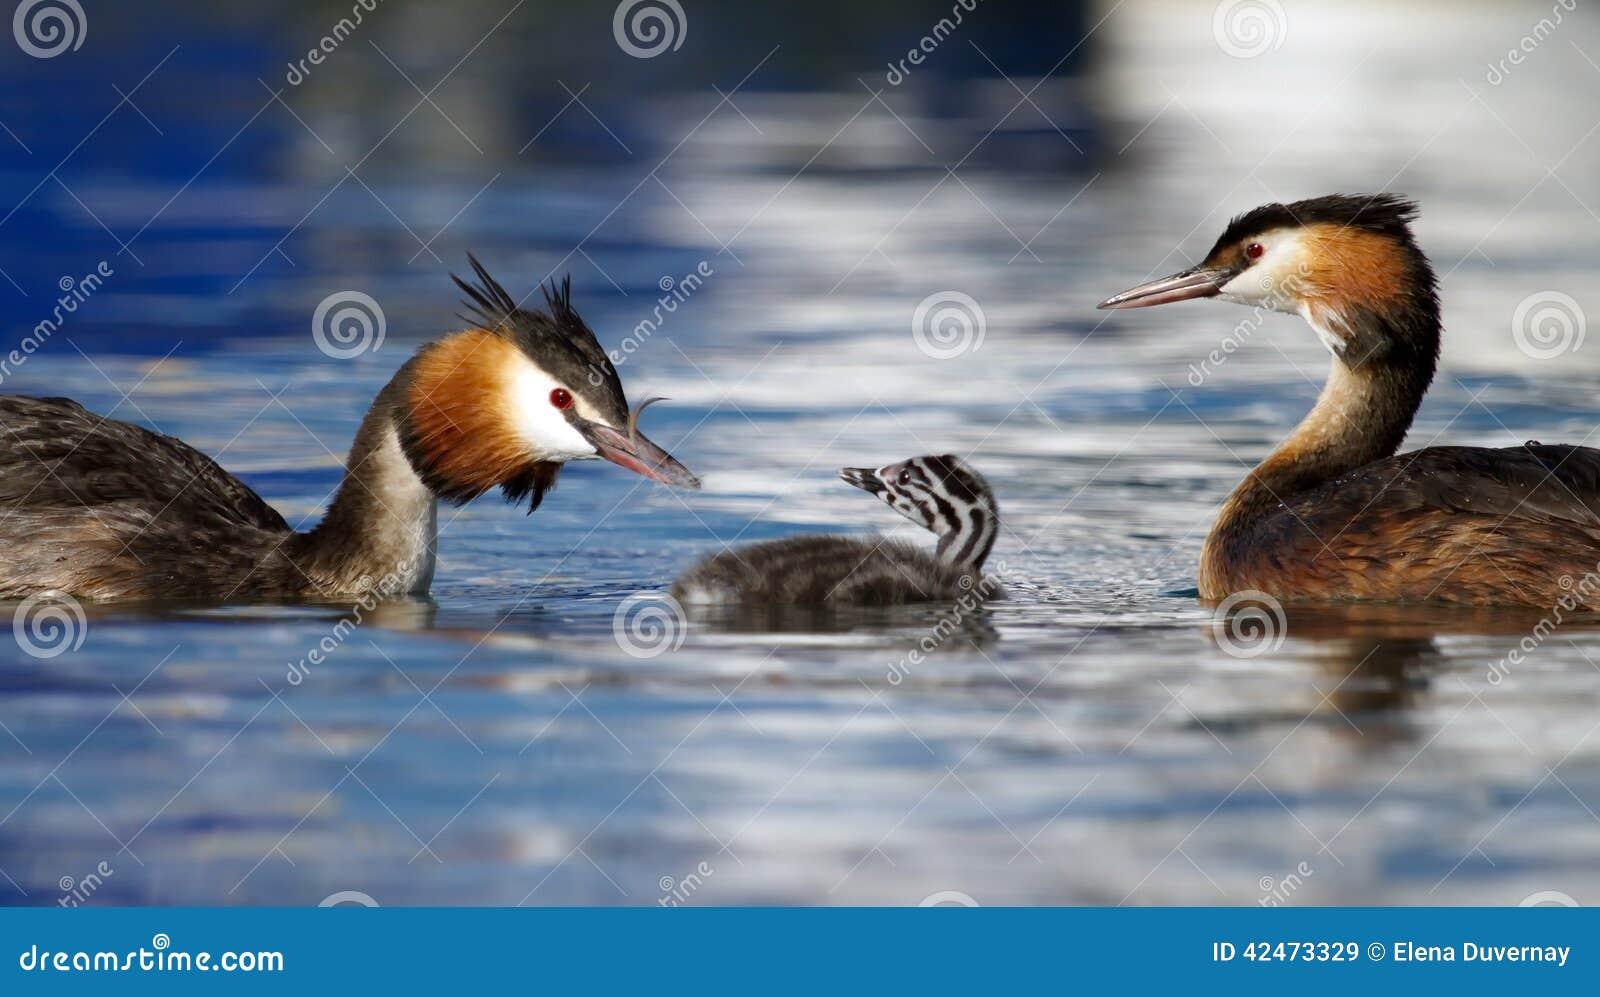 Taucher mit Haube, Podiceps cristatus, duckt Familie